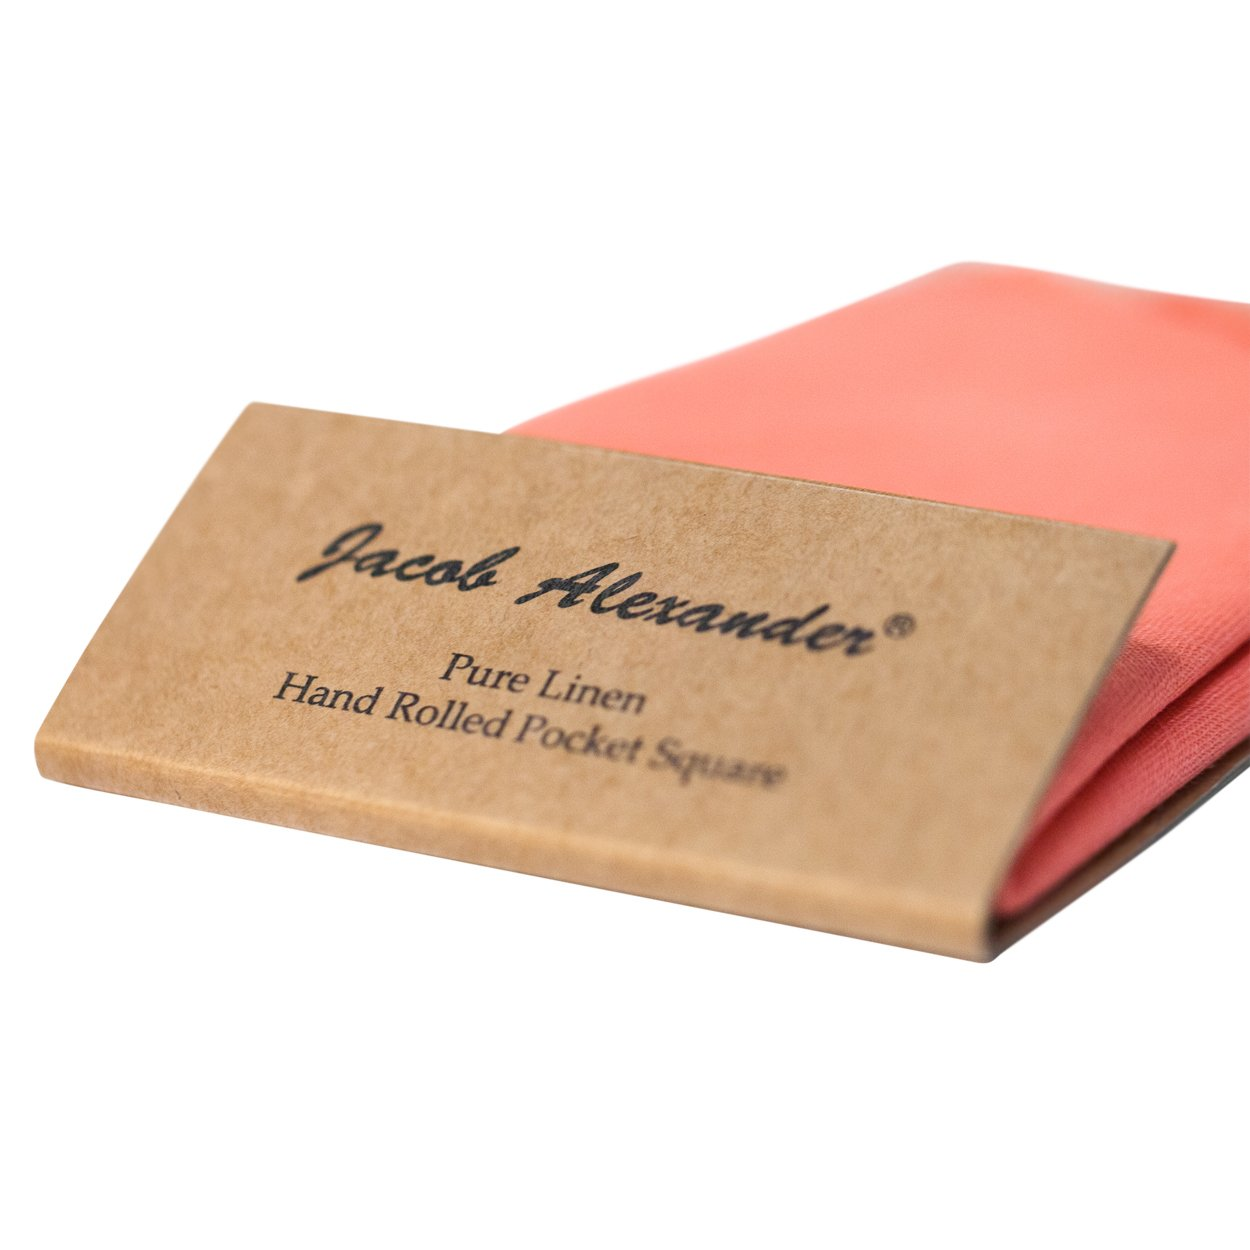 Jacob Alexander Linen Handrolled 15 x 15 Pocket Square Hanky White